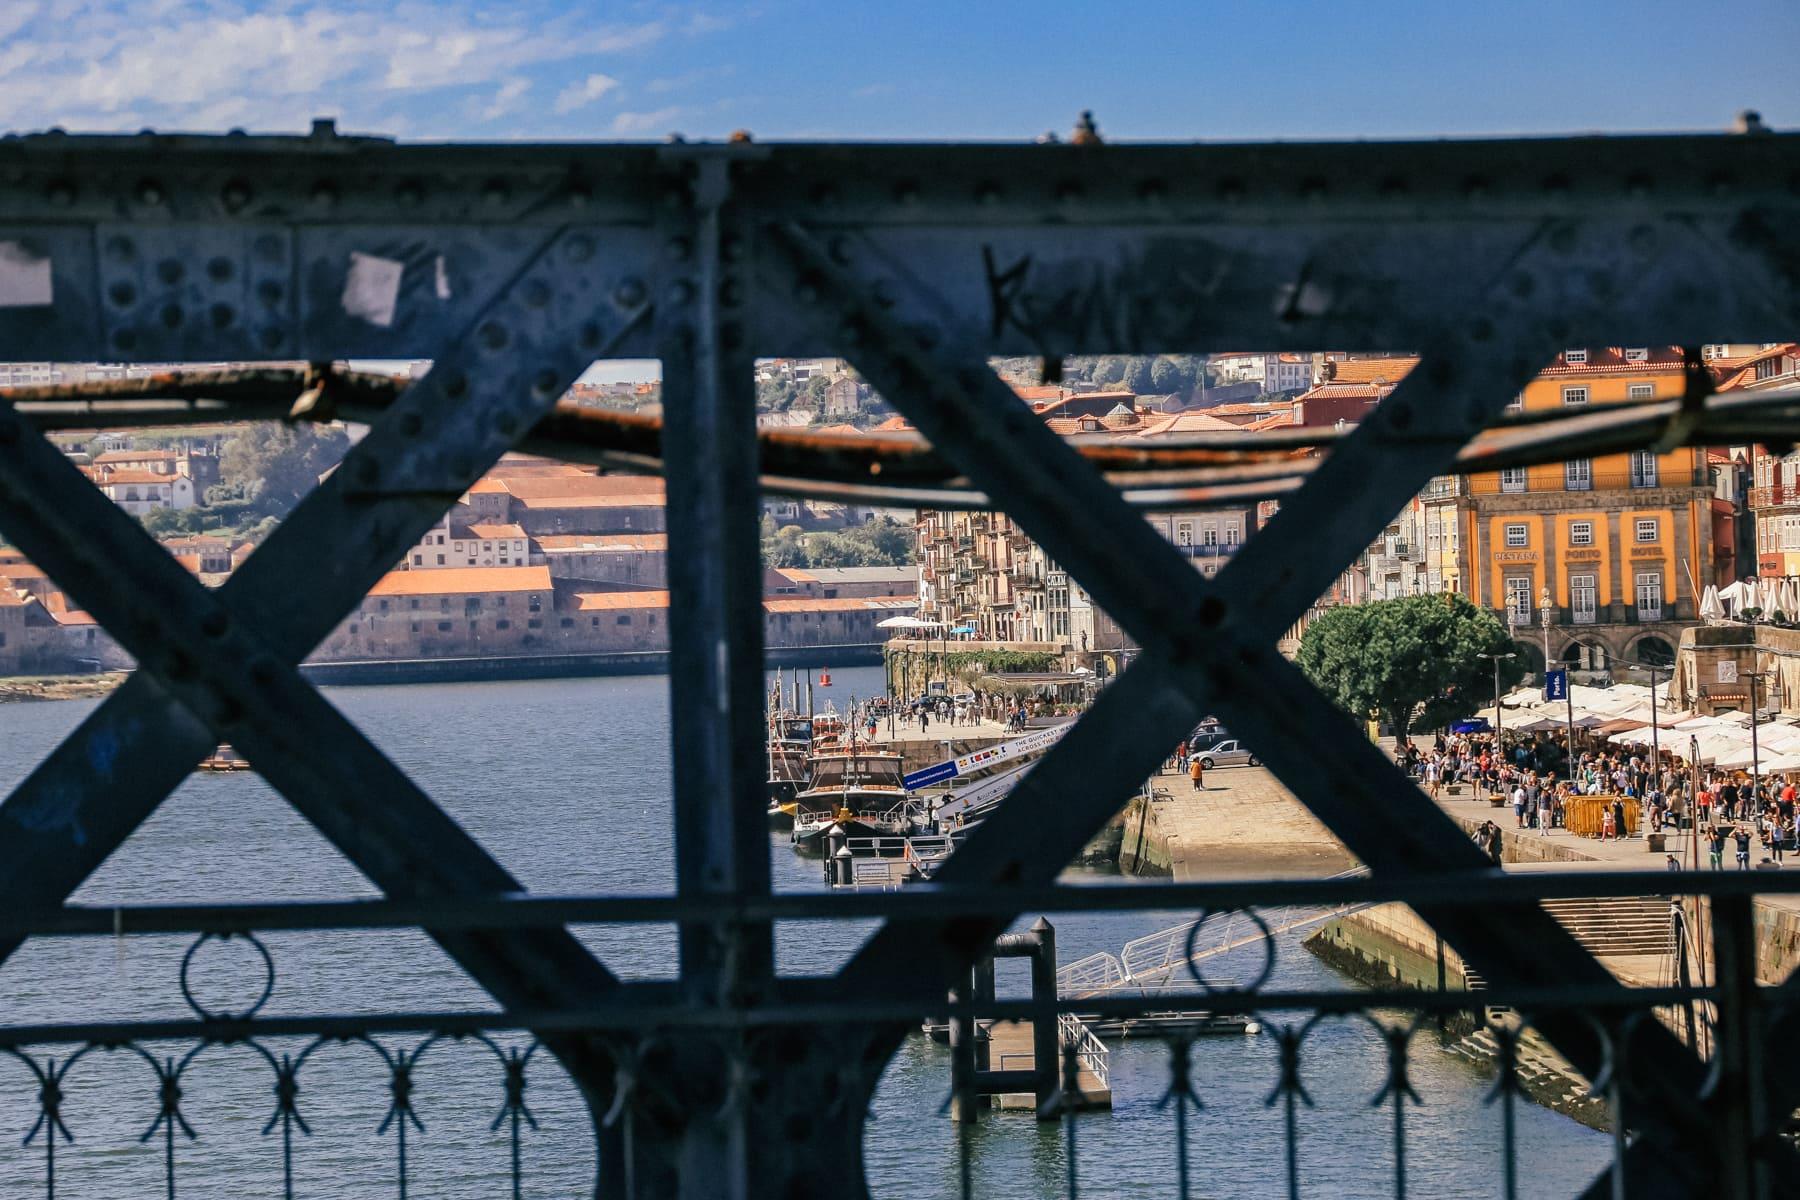 zehn-porto-tipps-fuer-deine-staedtereise-in-portugal-reiseblog-des-belles-choses 54